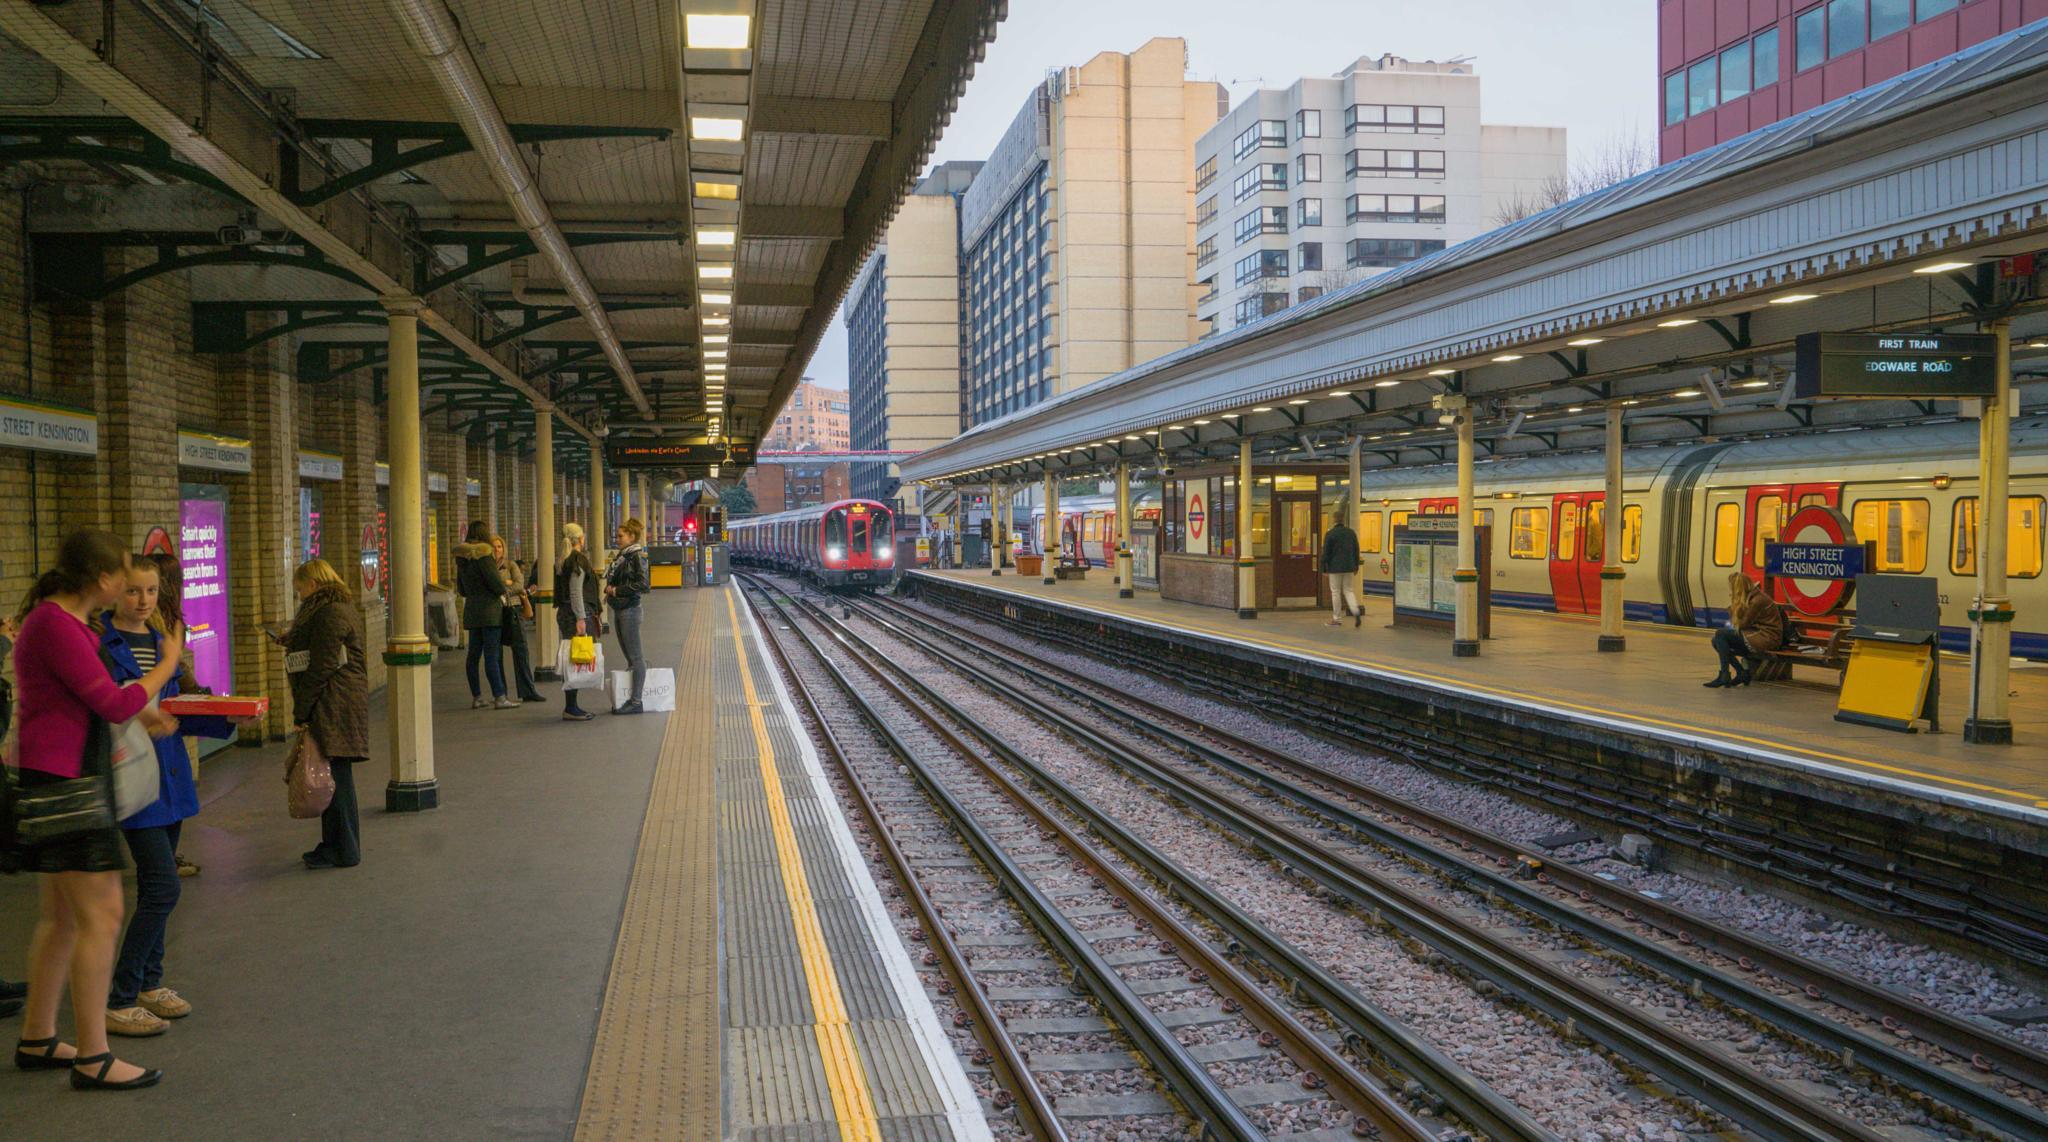 Leading Lines in London by Stephen Schwerdfeger